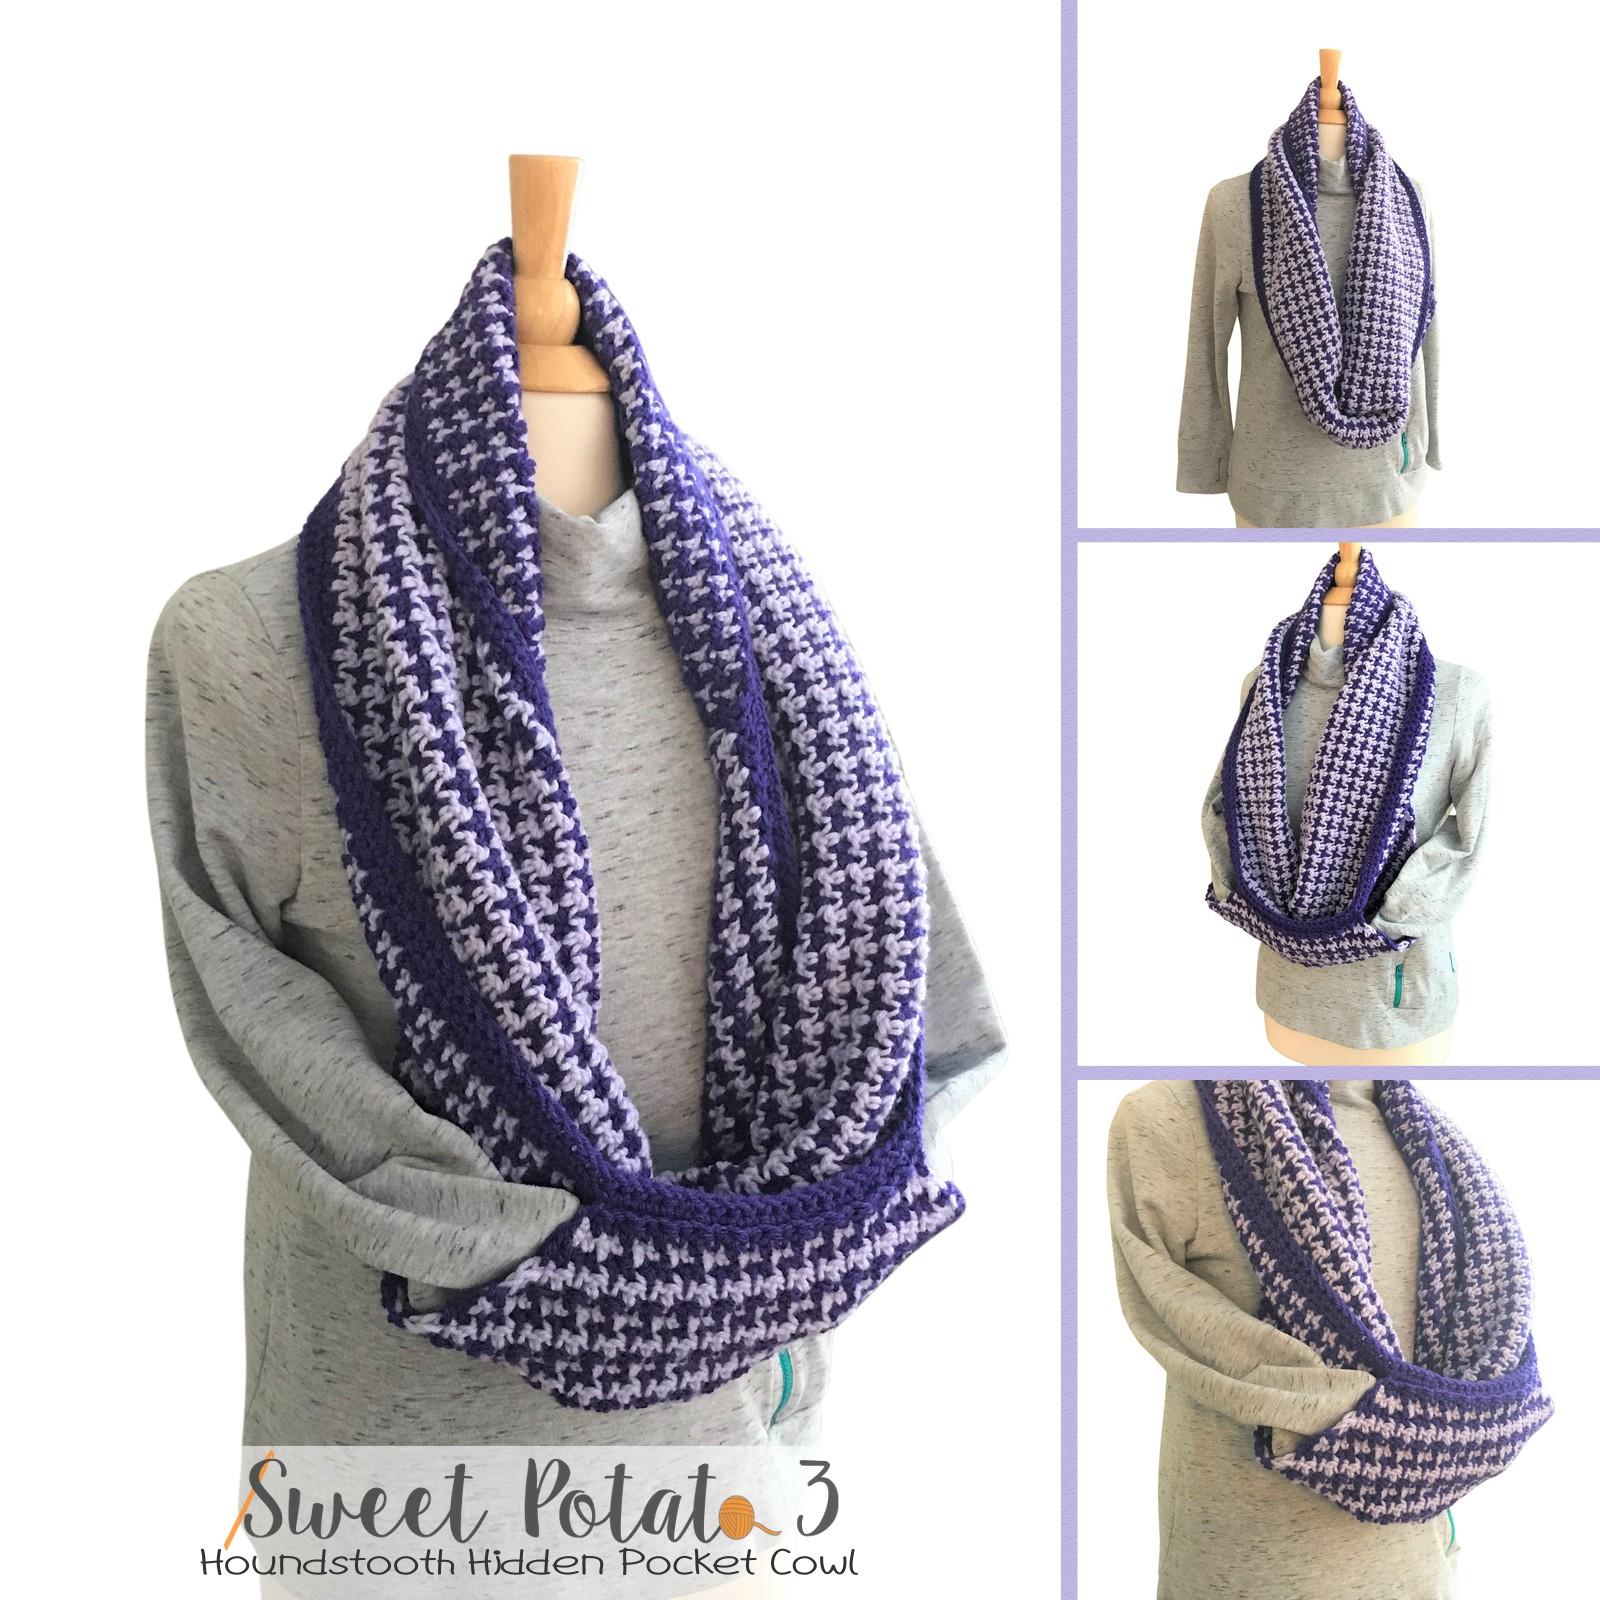 Houndstooth Pocket Cowl Crochet Pattern